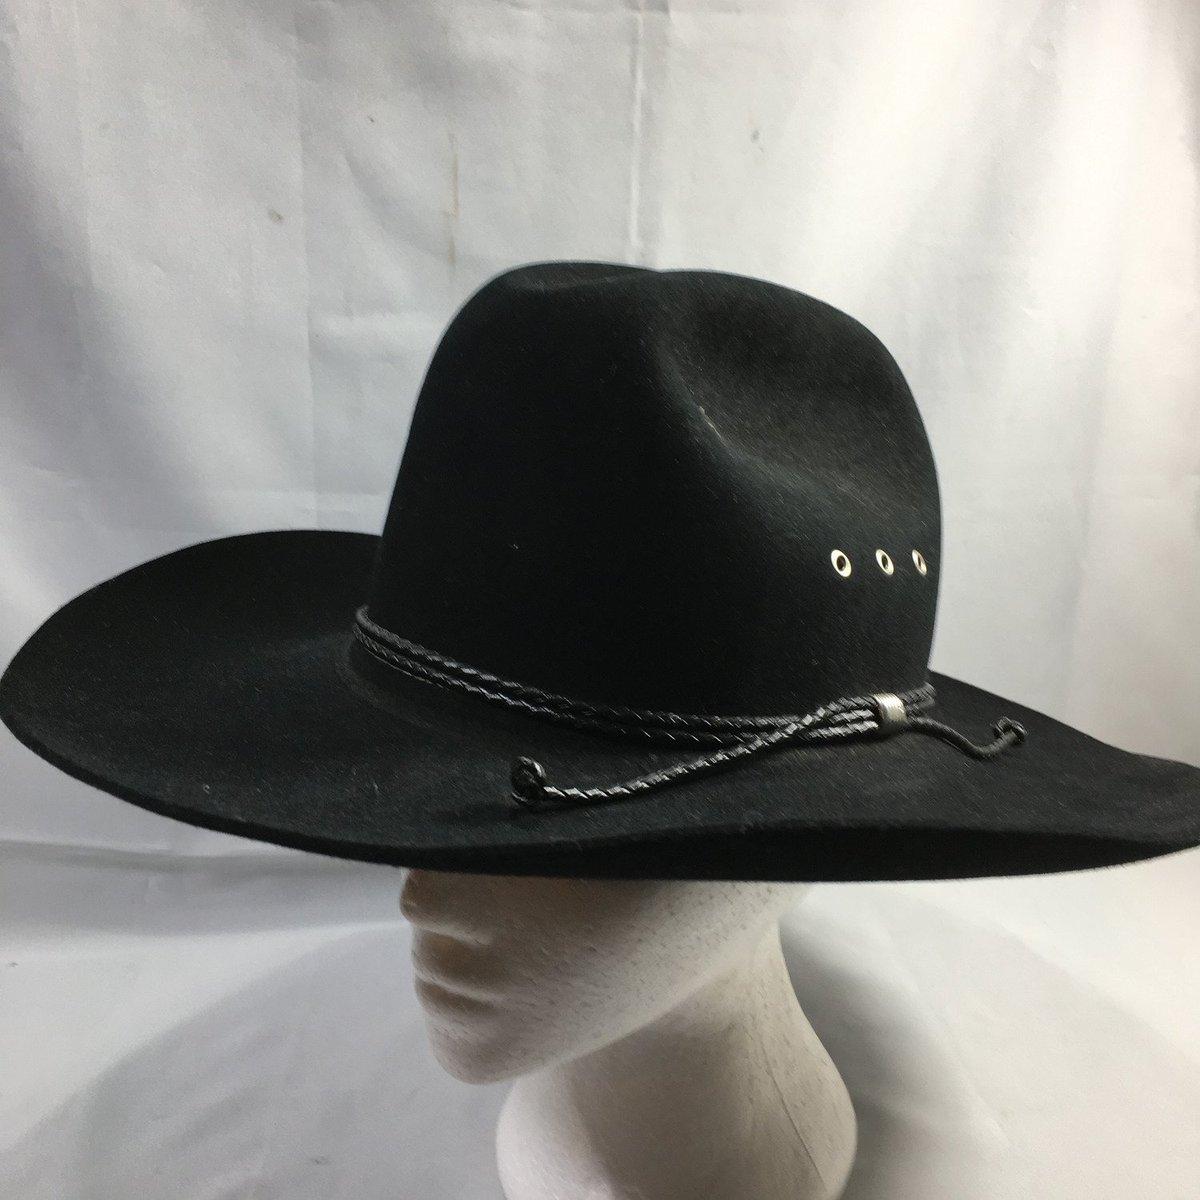 6a1b944f5528d Stetson K Tyler Beaver Felt Black Cowboy Hat Size 7  https   www.ebay.com itm 253934257724 …  stetson  cowboy  cowgirl  cowboyhat   western  hats  boots ...